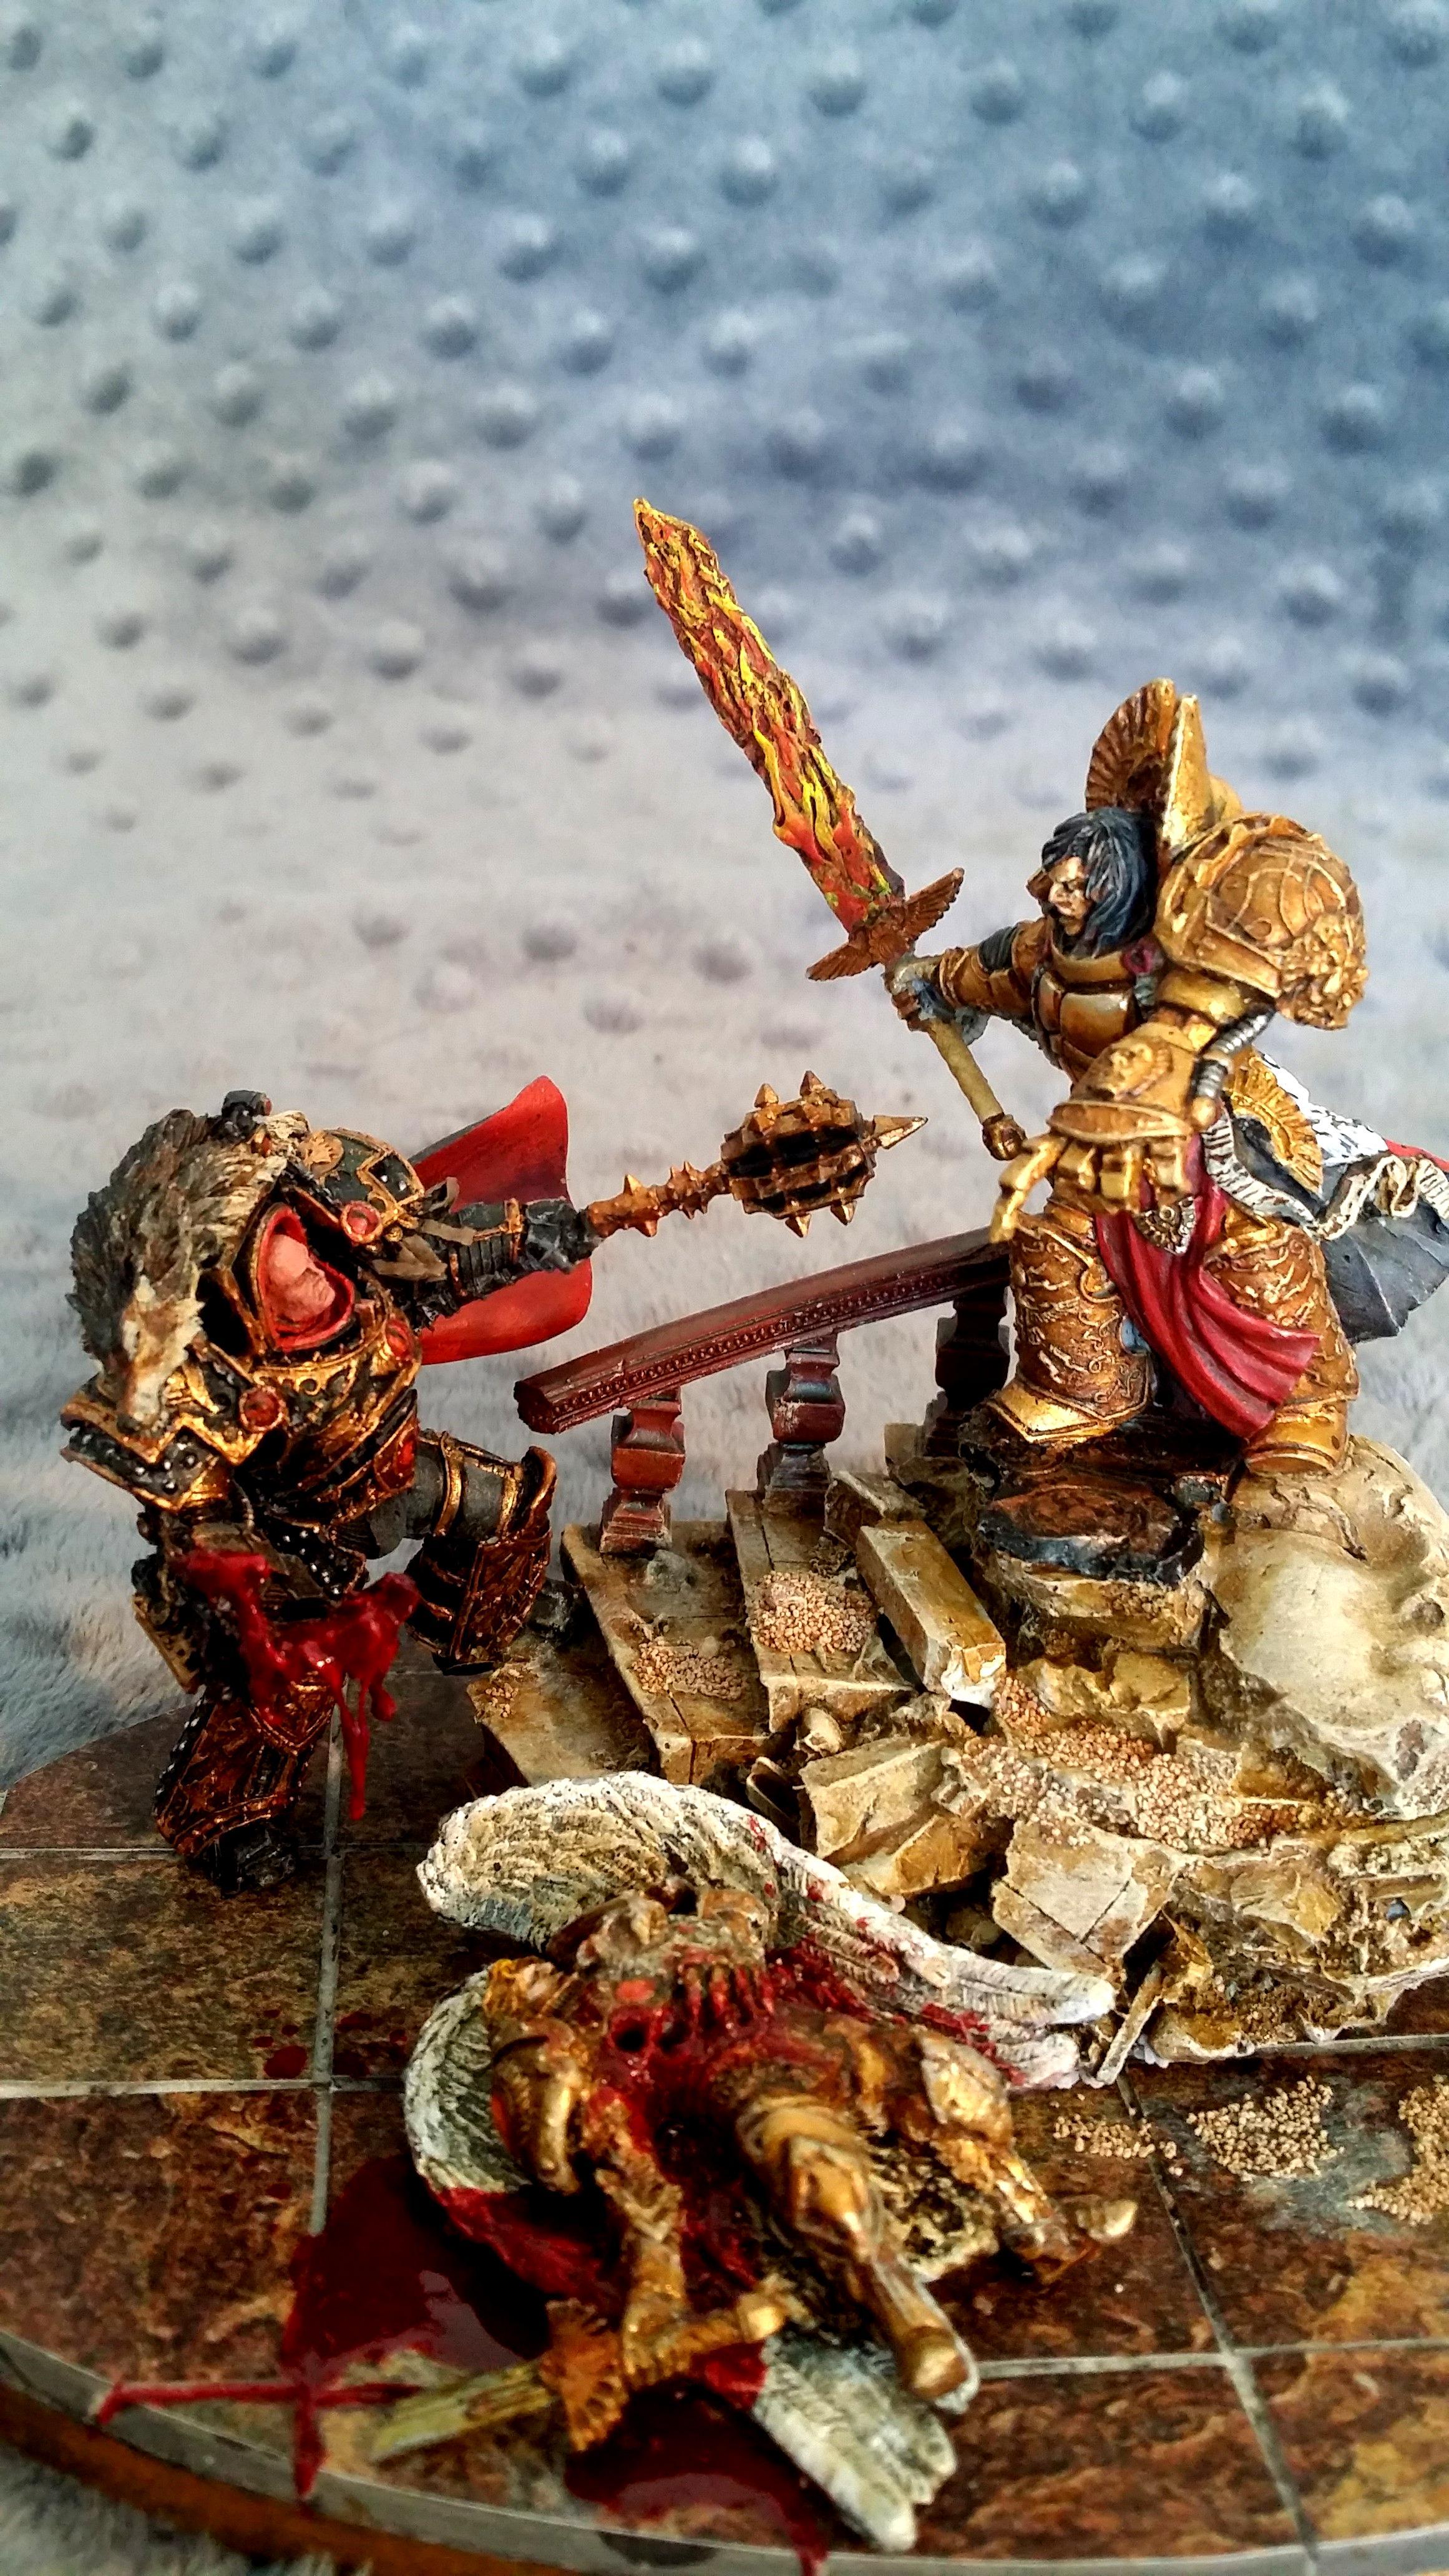 Emperor, Final Battle, Horus, Horus Heresy, Horus Vs The Emperor